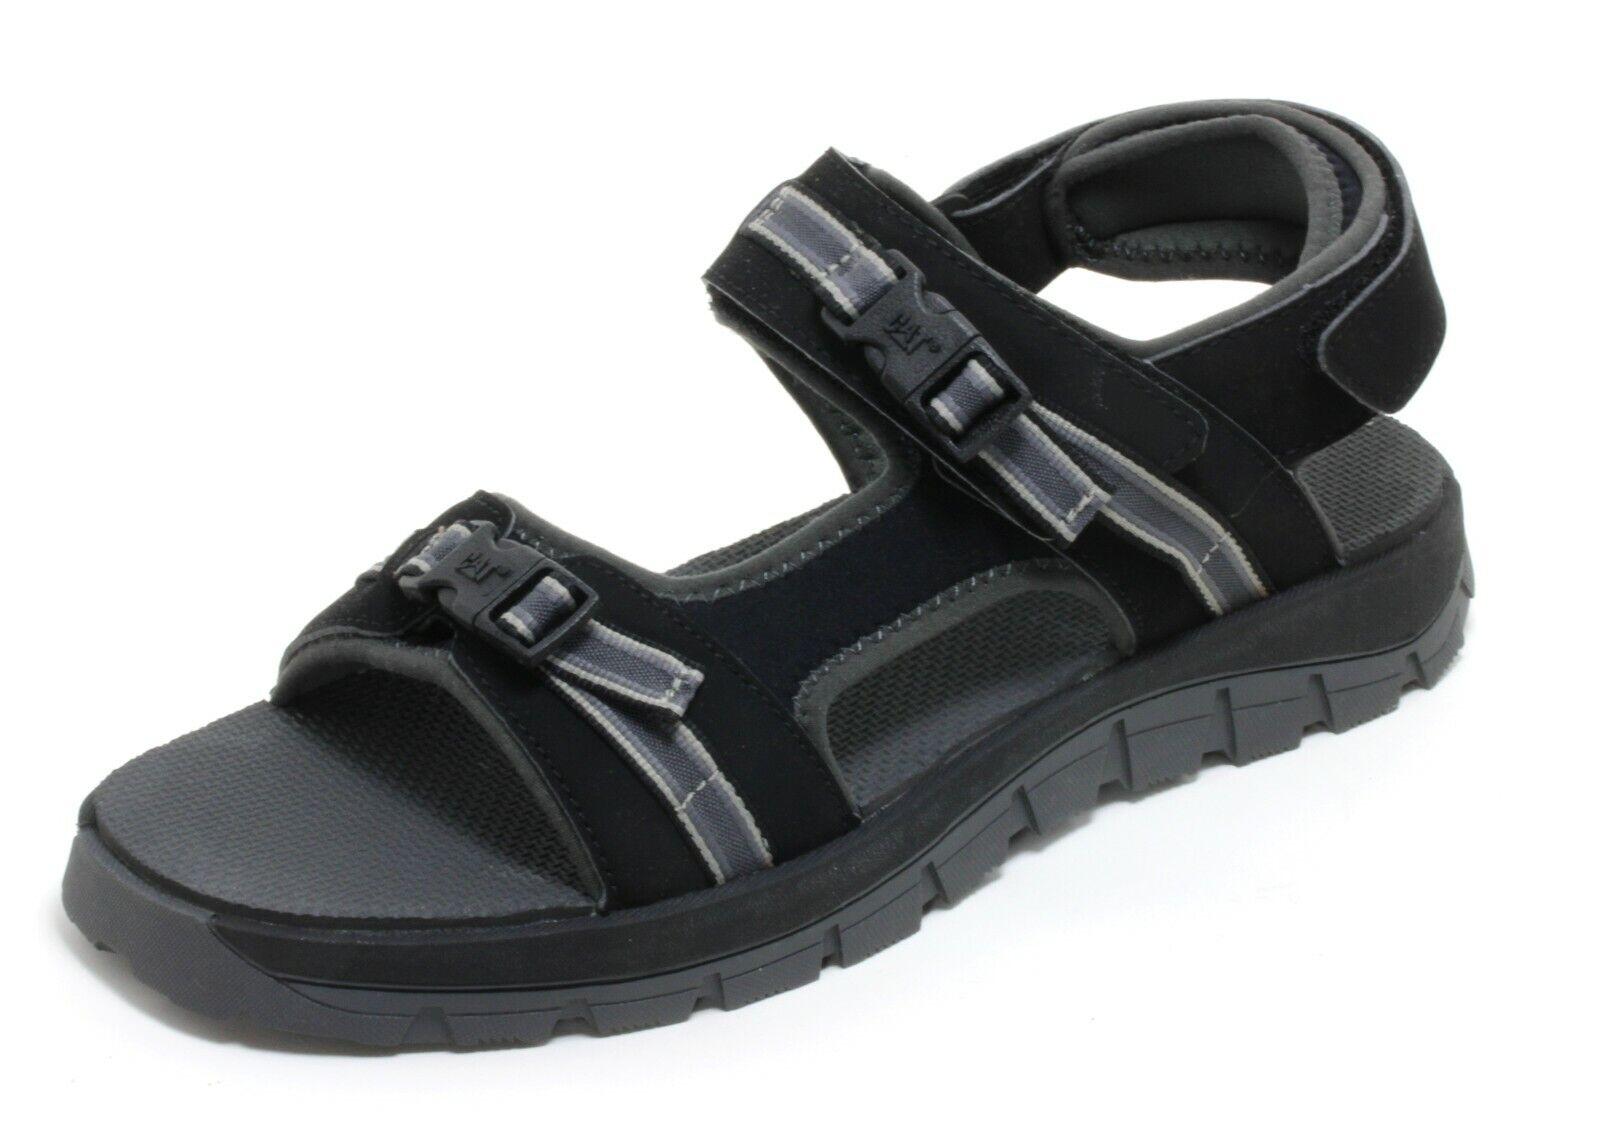 738 Sandal Trekking Touch Fastener Outdoor Shoes Summer Leather Caterpillar 46